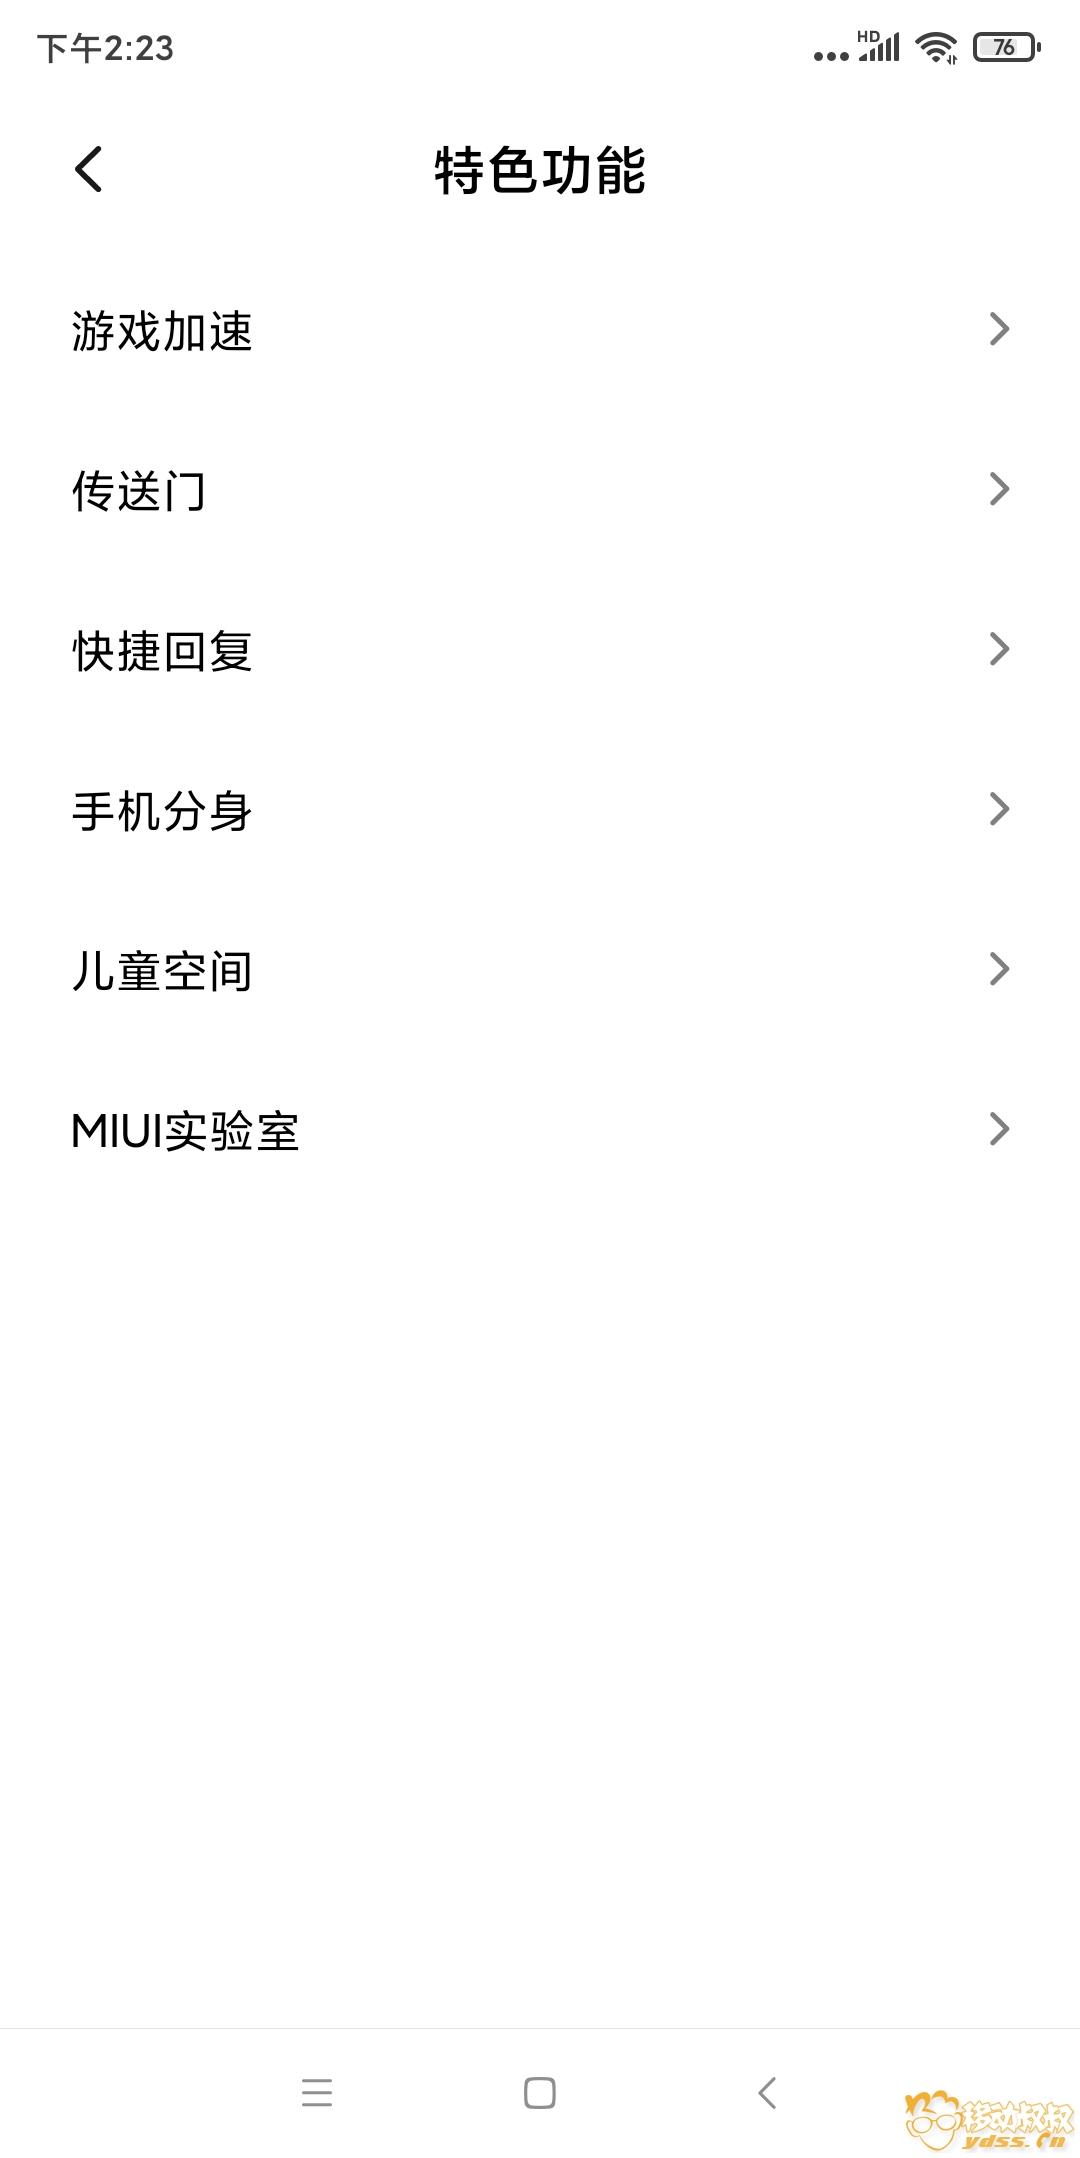 Screenshot_2019-11-13-14-23-40-226_com.android.settings.jpg